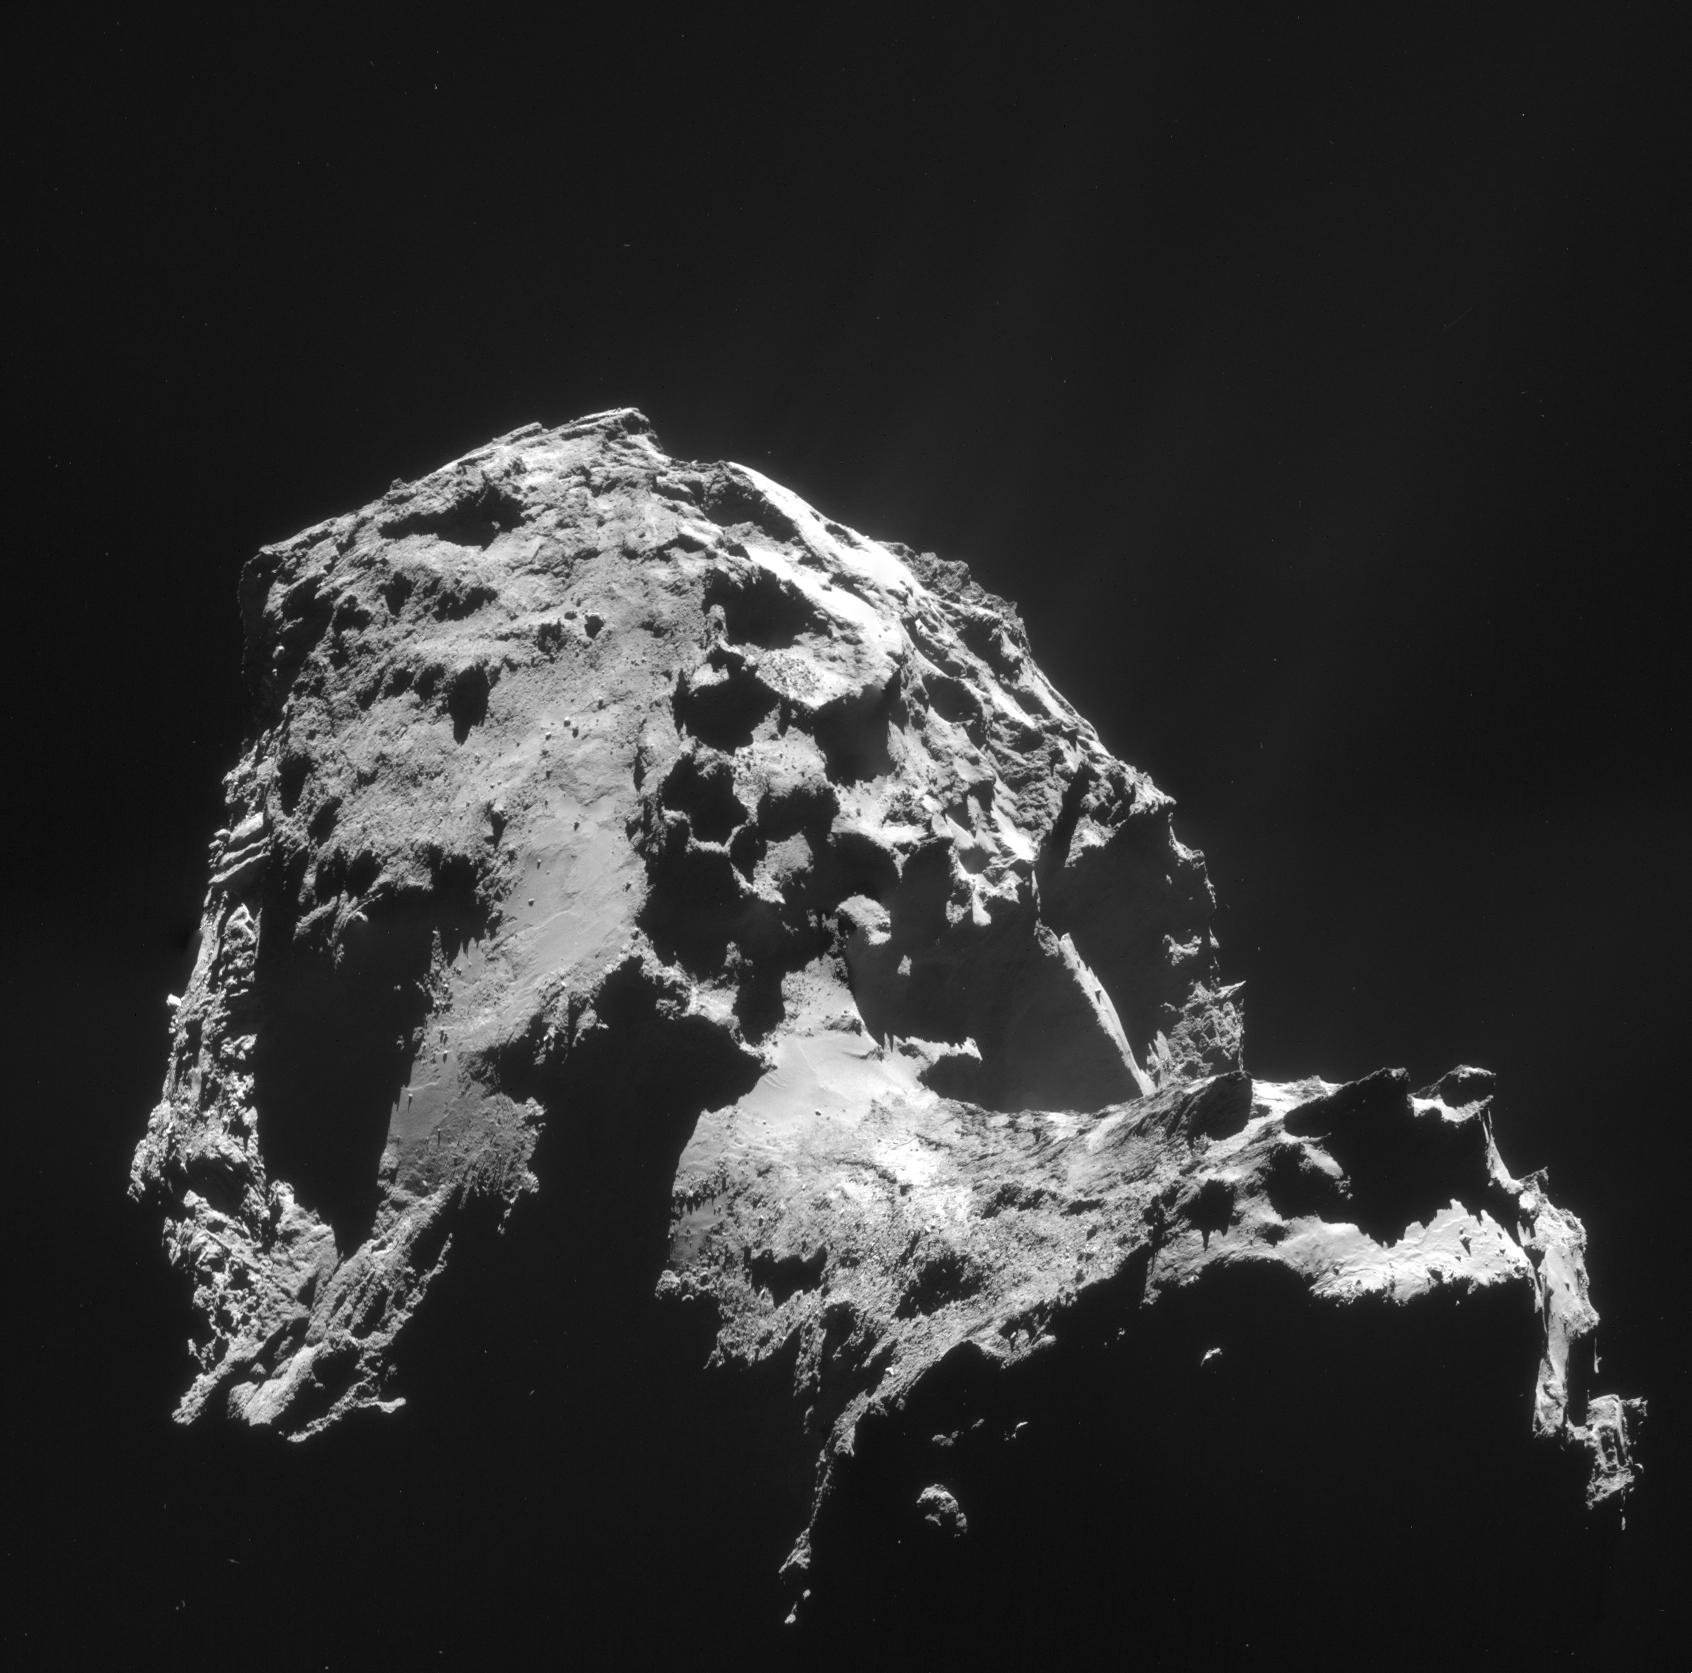 Four-image mosaic of Comet 67P/C-G comprising images taken on 1 January 2015. Credits: ESA/Rosetta/NAVCAM – CC BY-SA IGO 3.0